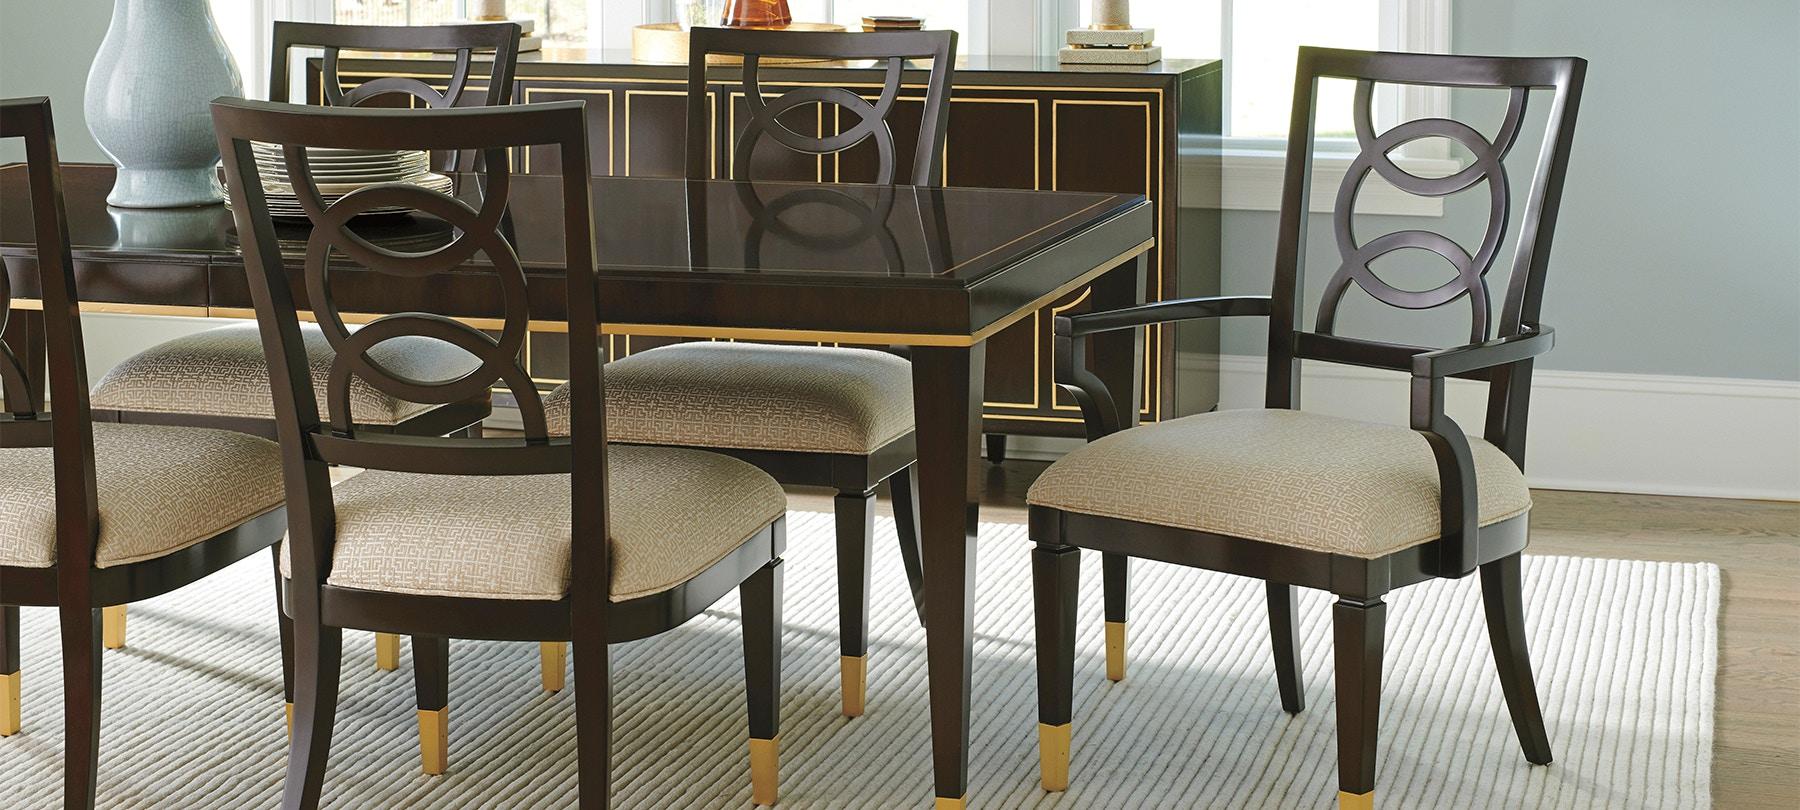 Furniture Store In Woodbridge, NJ : Home Inspirations